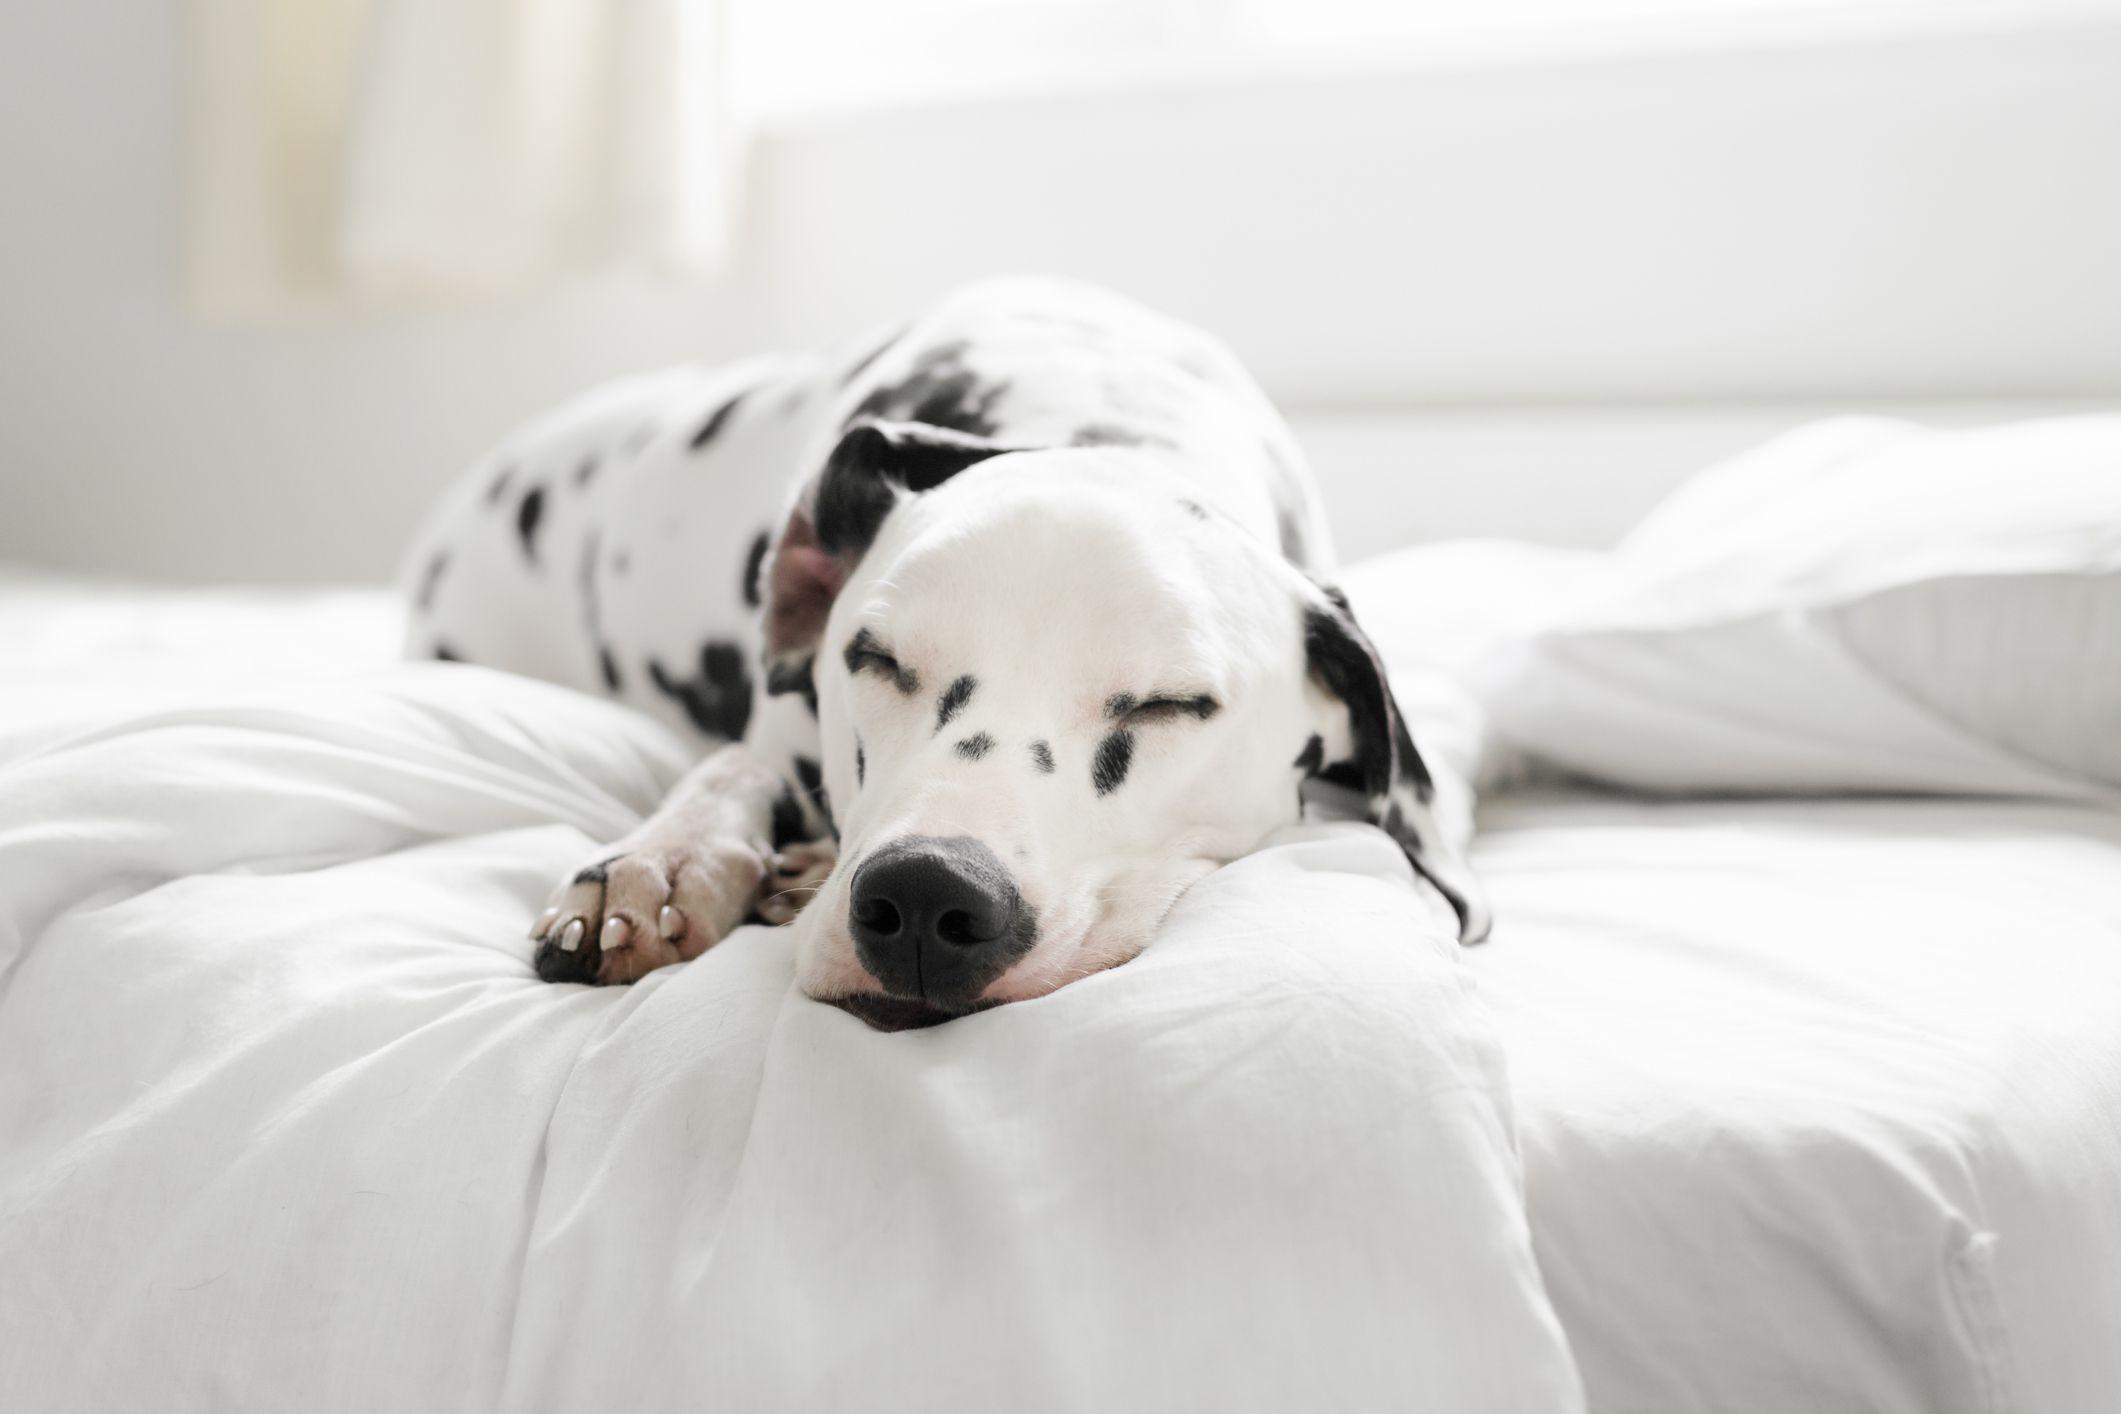 A Dalmatian napping.